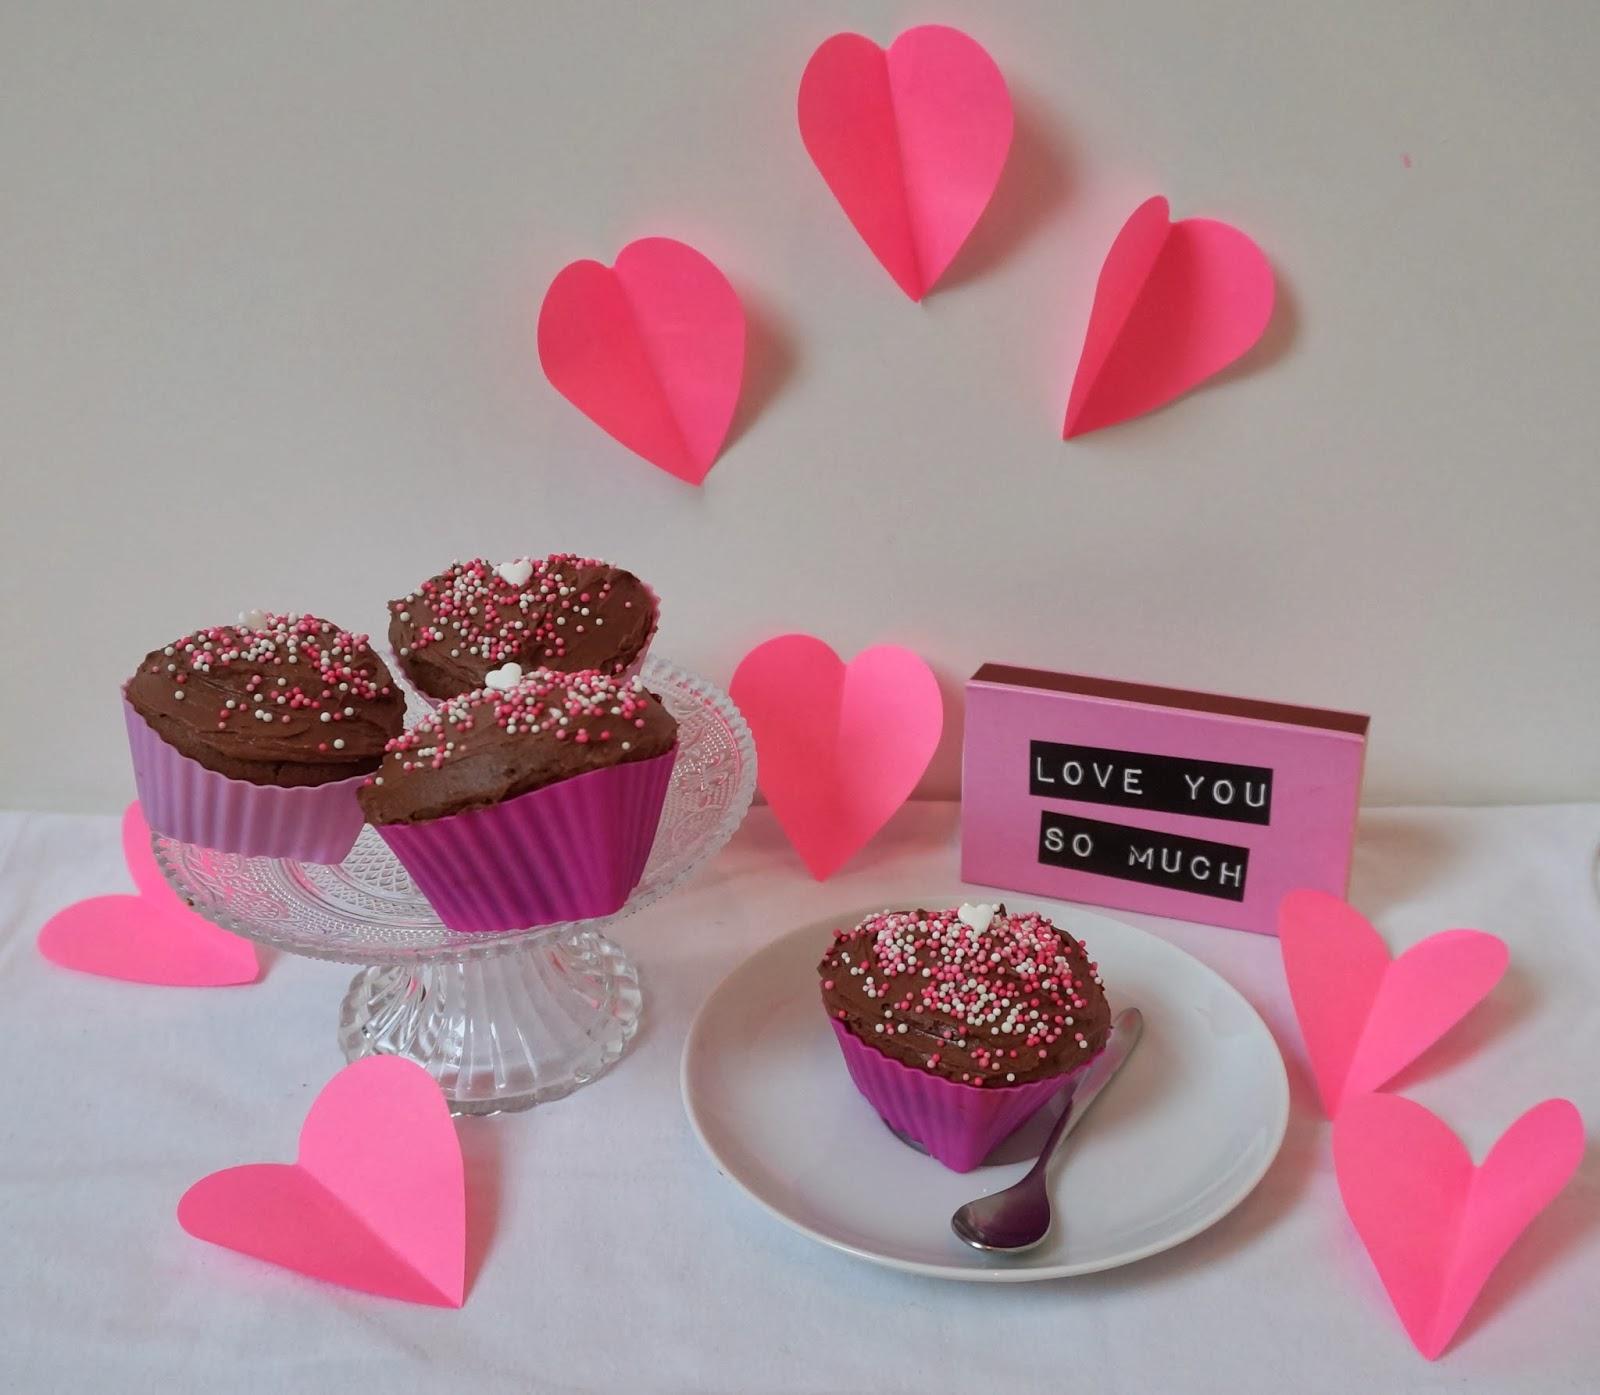 valentines day part 2 schokoladen nutella cupcakes in herzform victoria 39 s little secrets. Black Bedroom Furniture Sets. Home Design Ideas